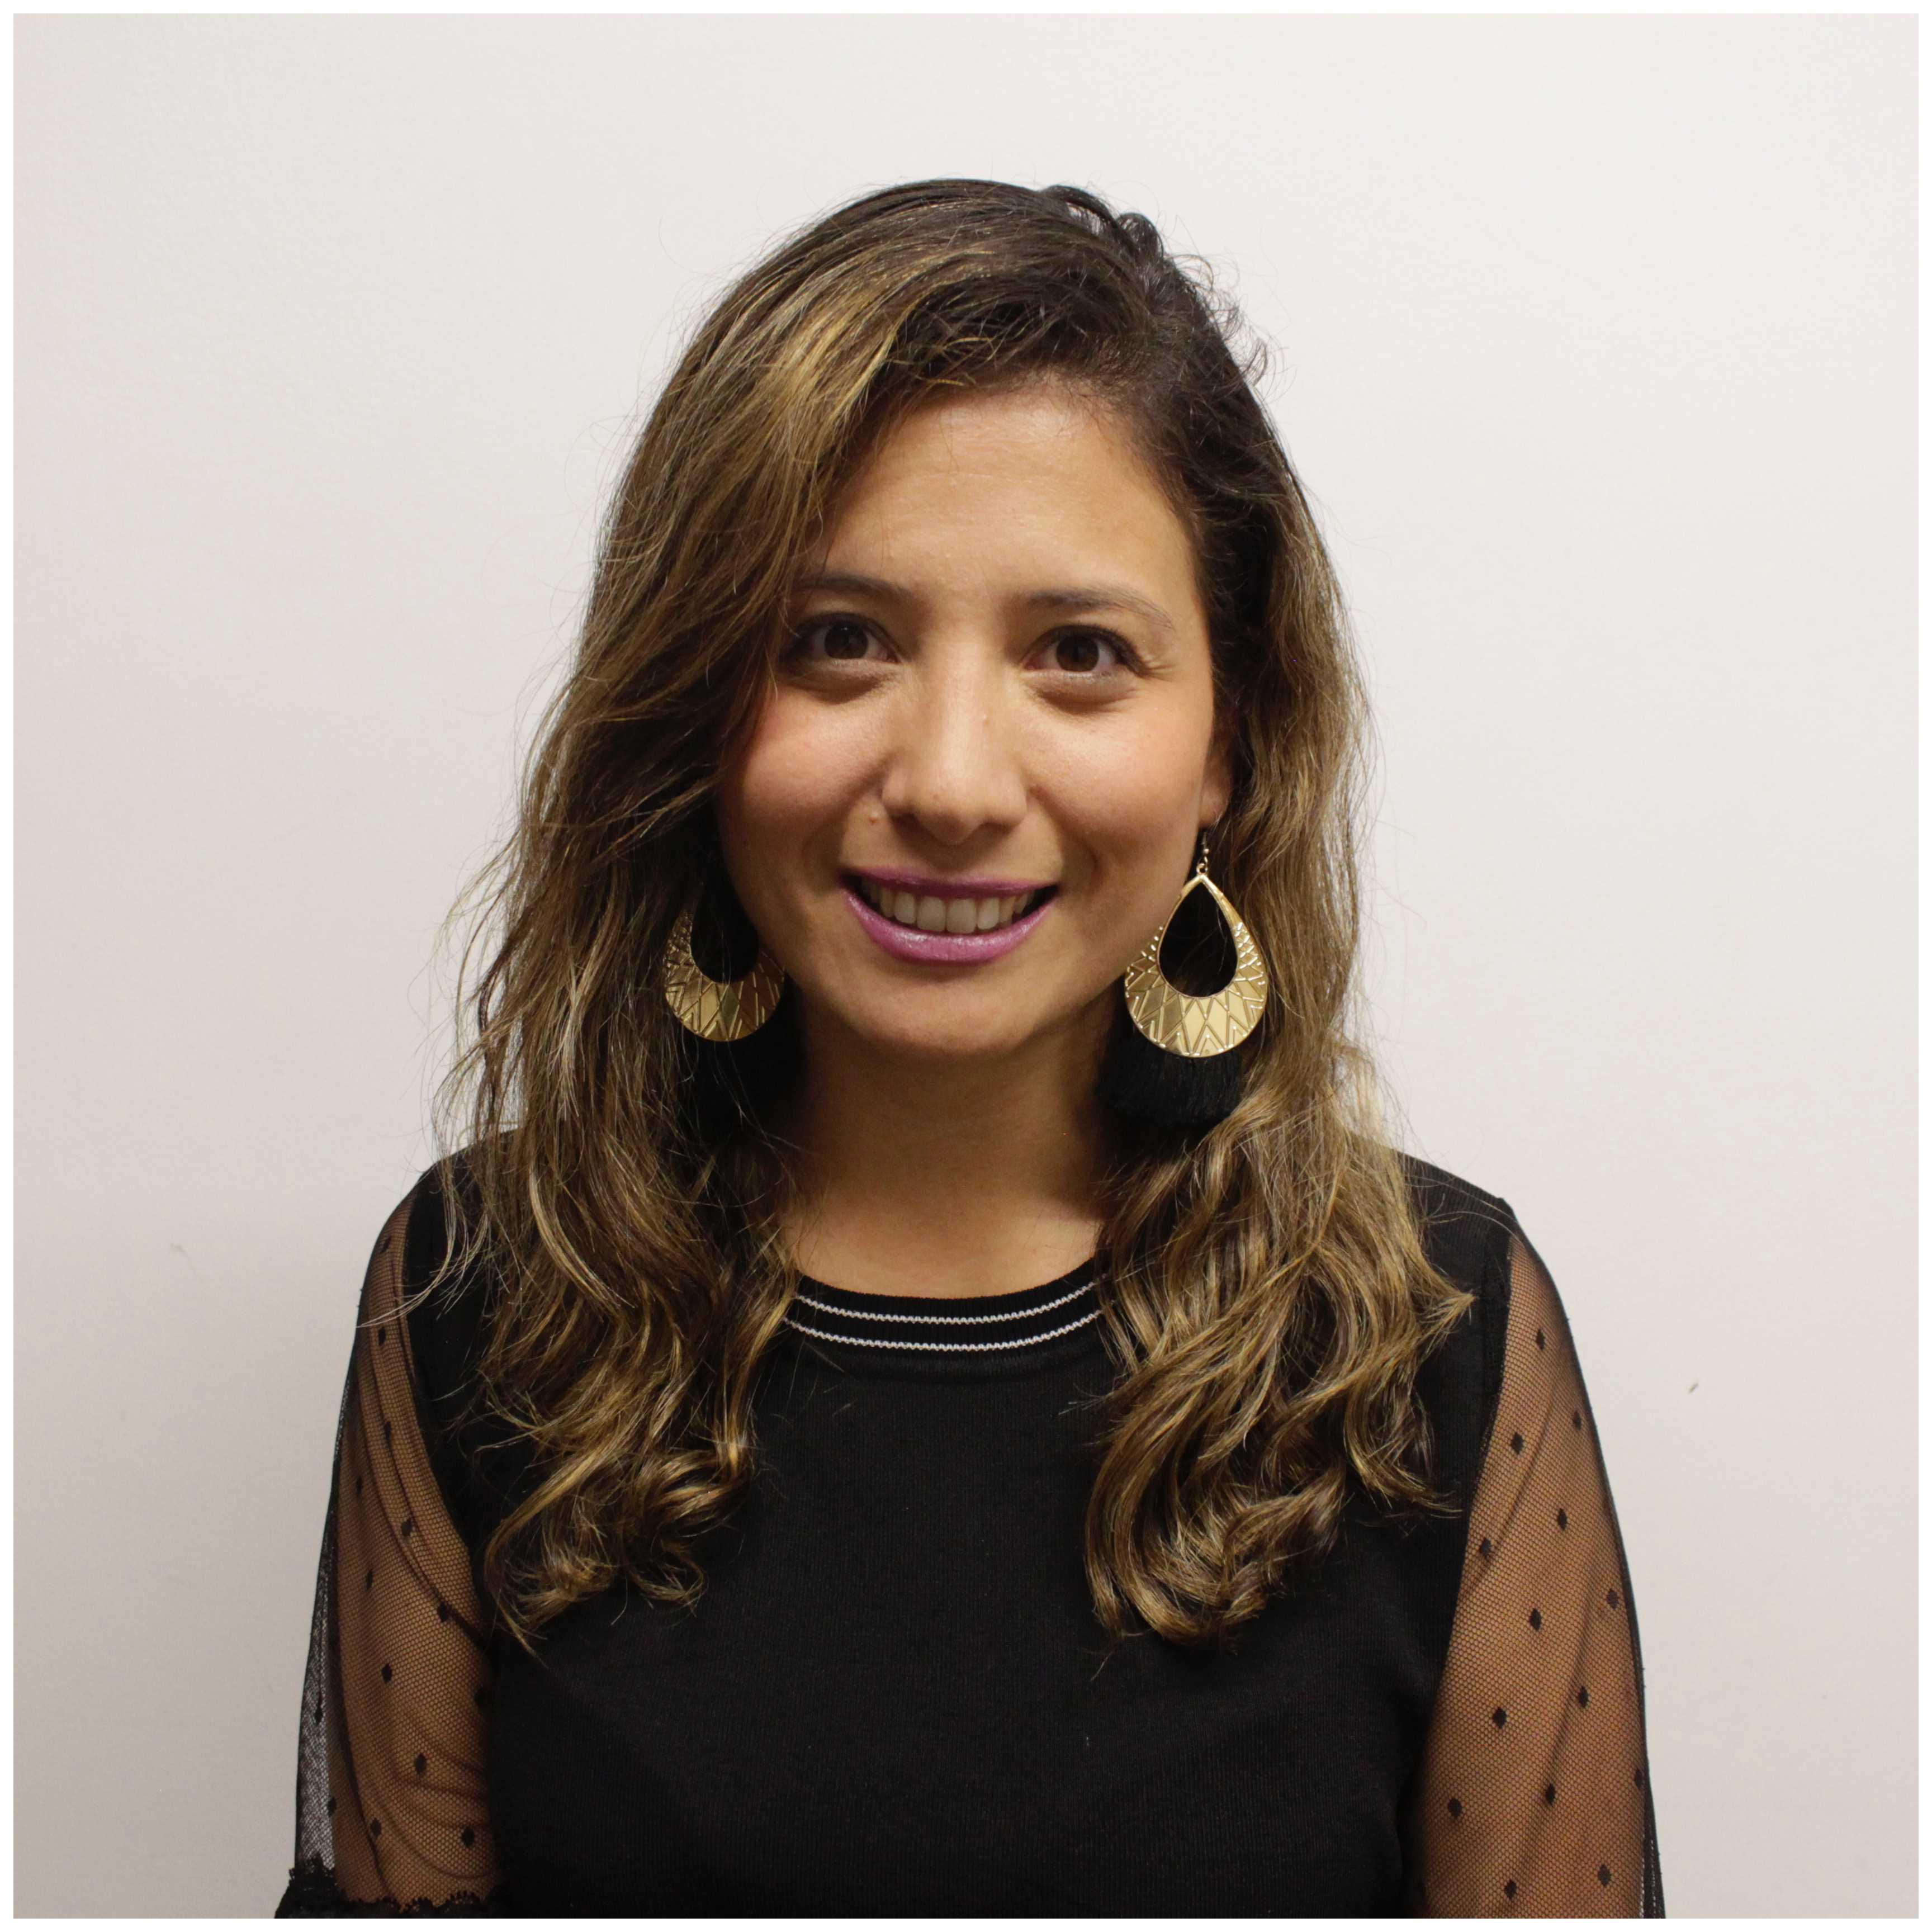 Maria Camila López